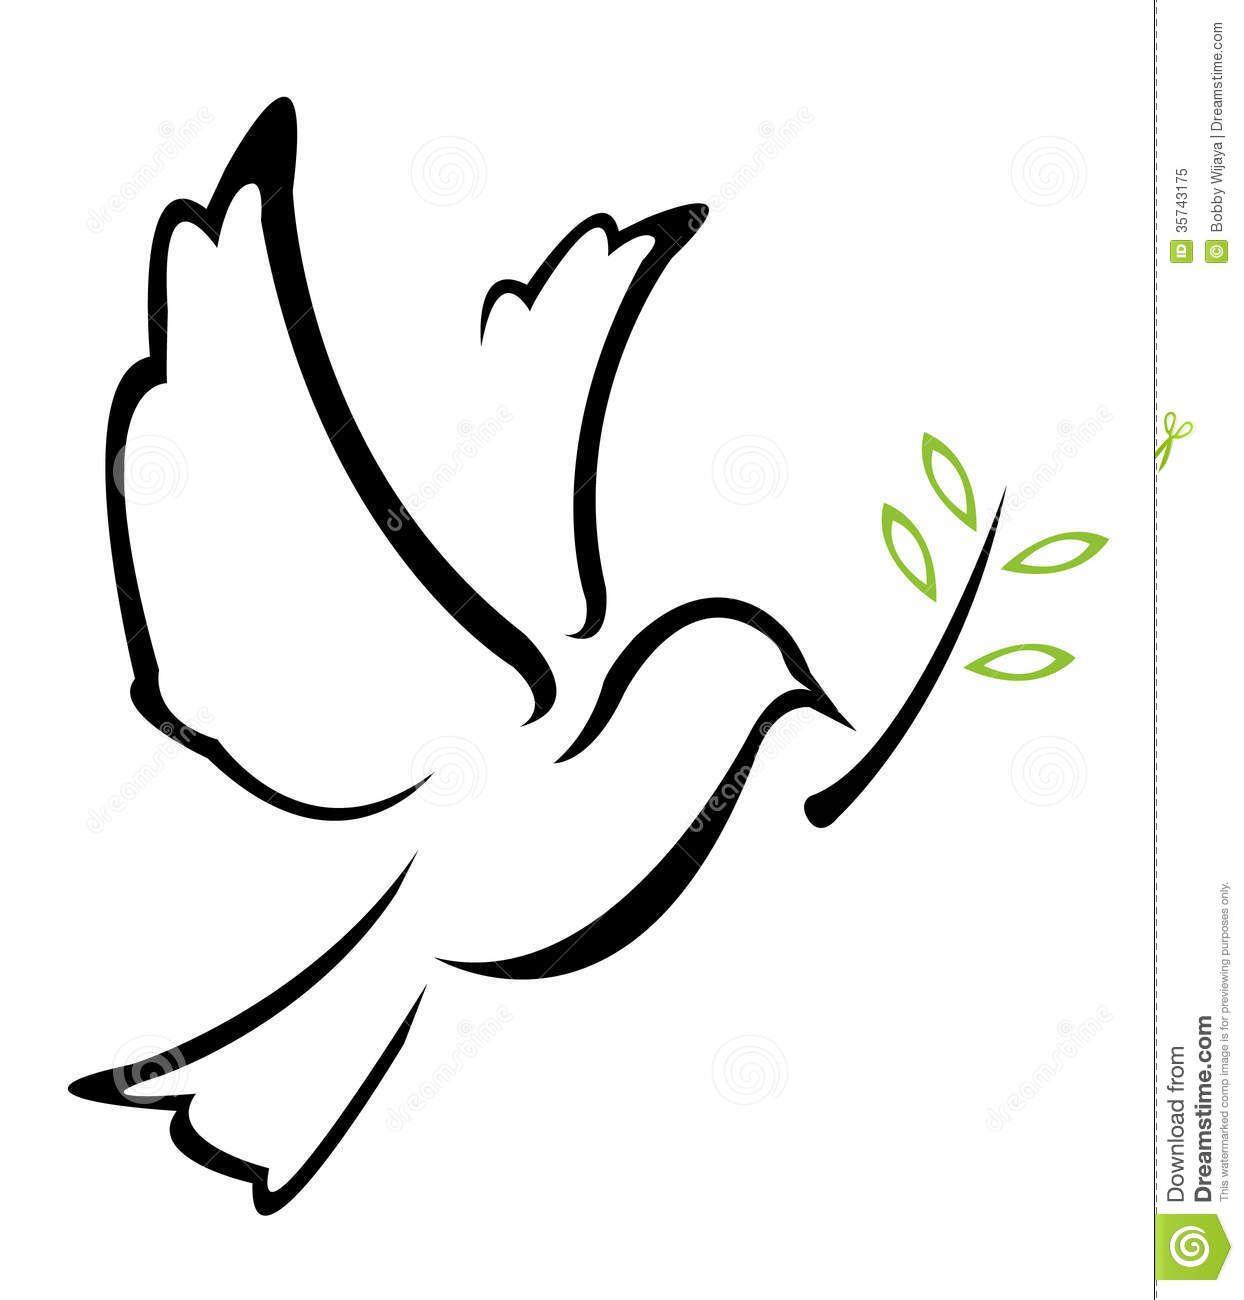 dove symbol stock photos � 4330 dove symbol stock images